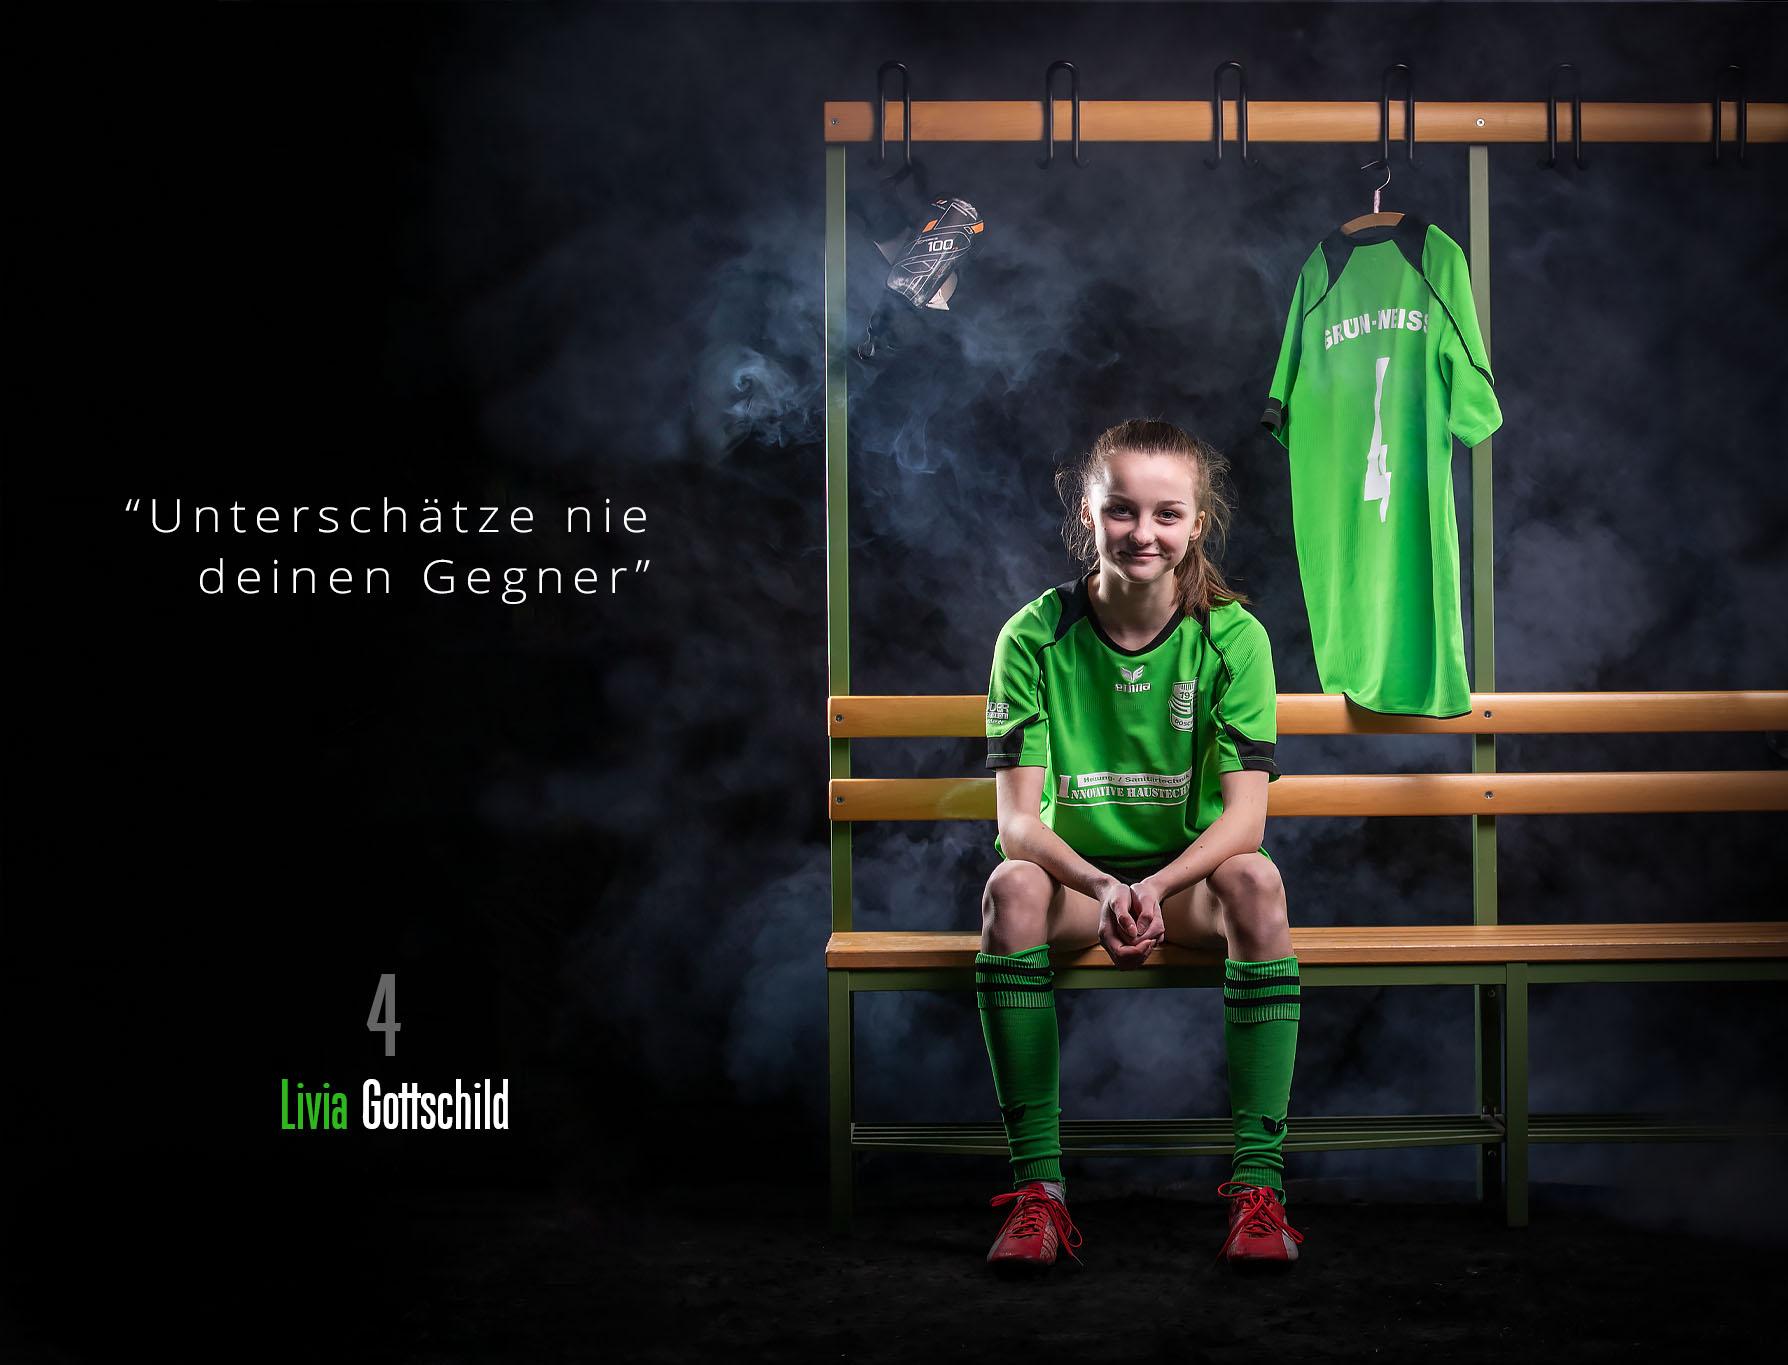 livia-gottschild-web